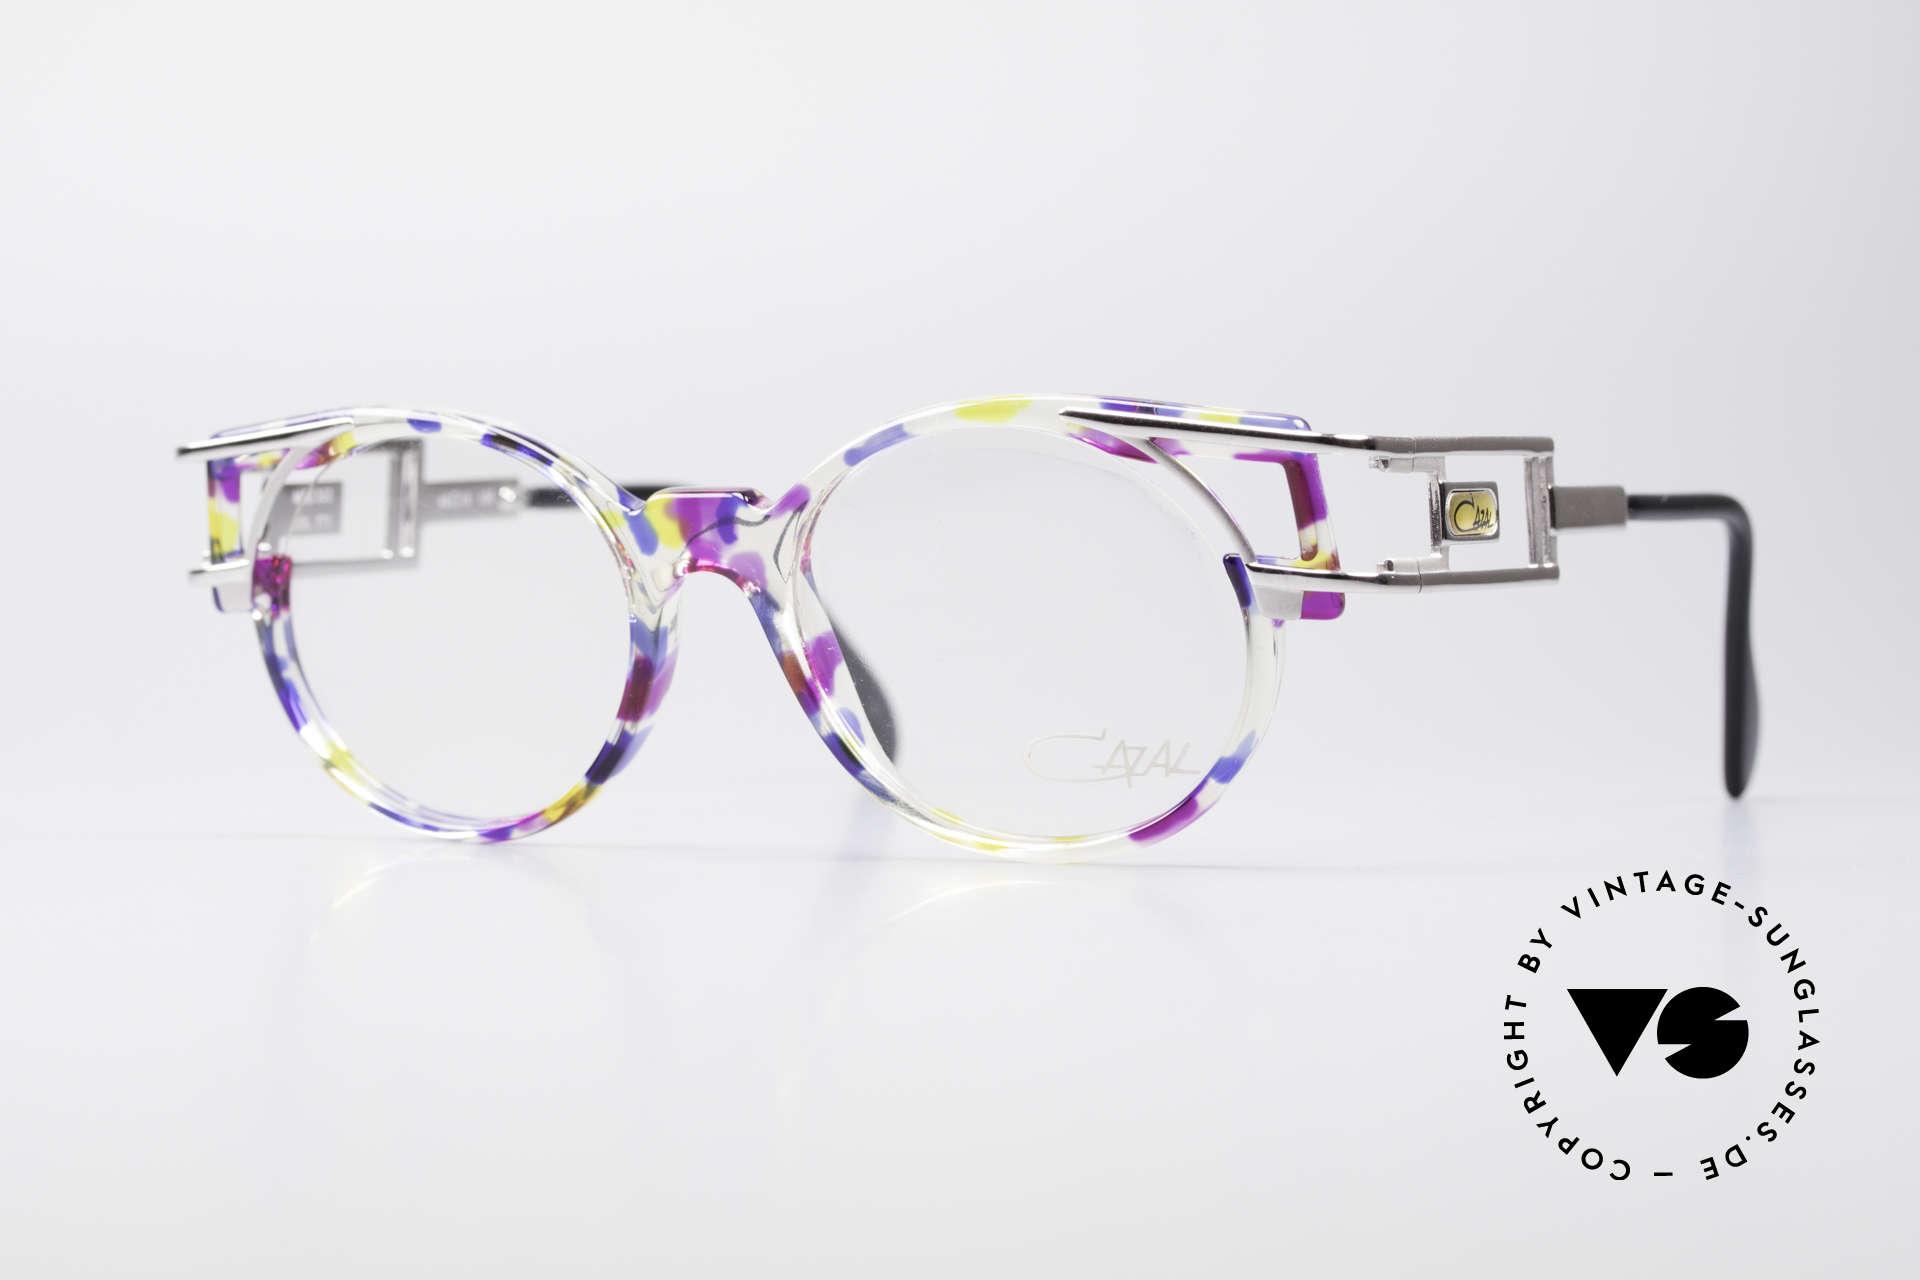 Cazal 353 Old School Hip Hop Frame, true vintage Cazal designer eyeglass-frame from 1991, Made for Men and Women